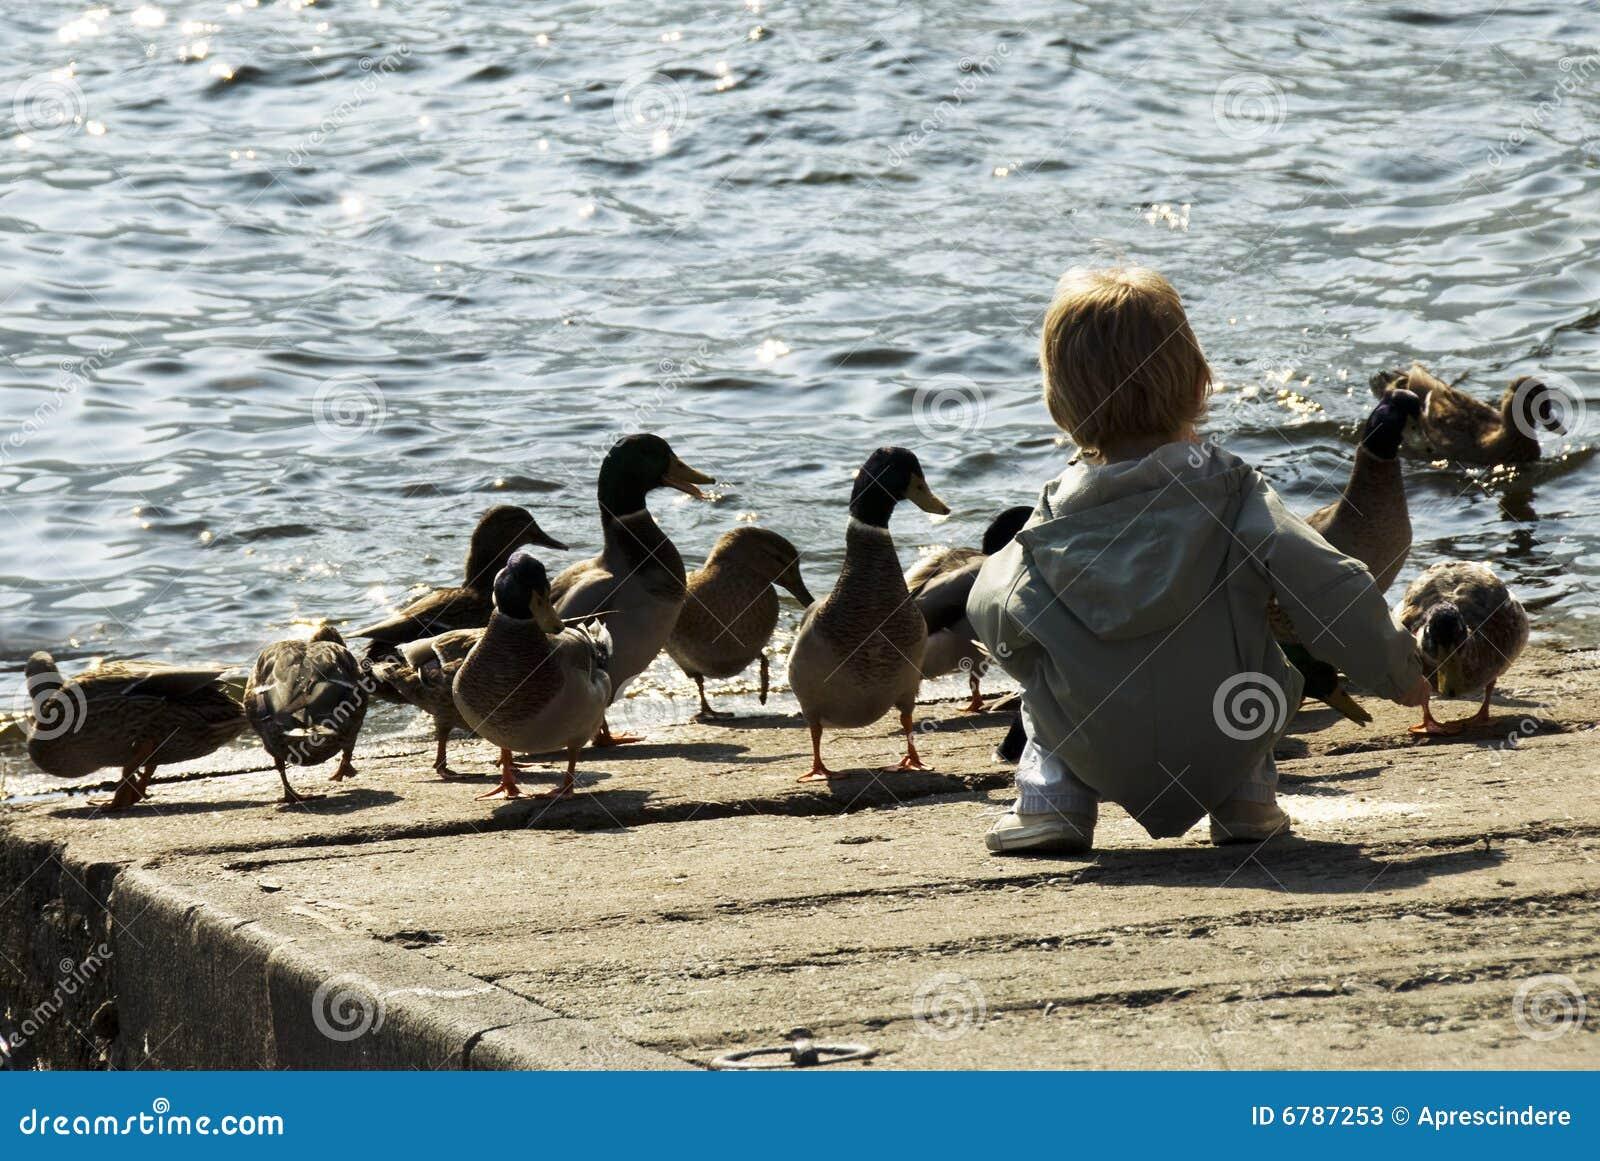 boy feeding ducks stock photos image 6787253 goose clipart spring geese clipart free